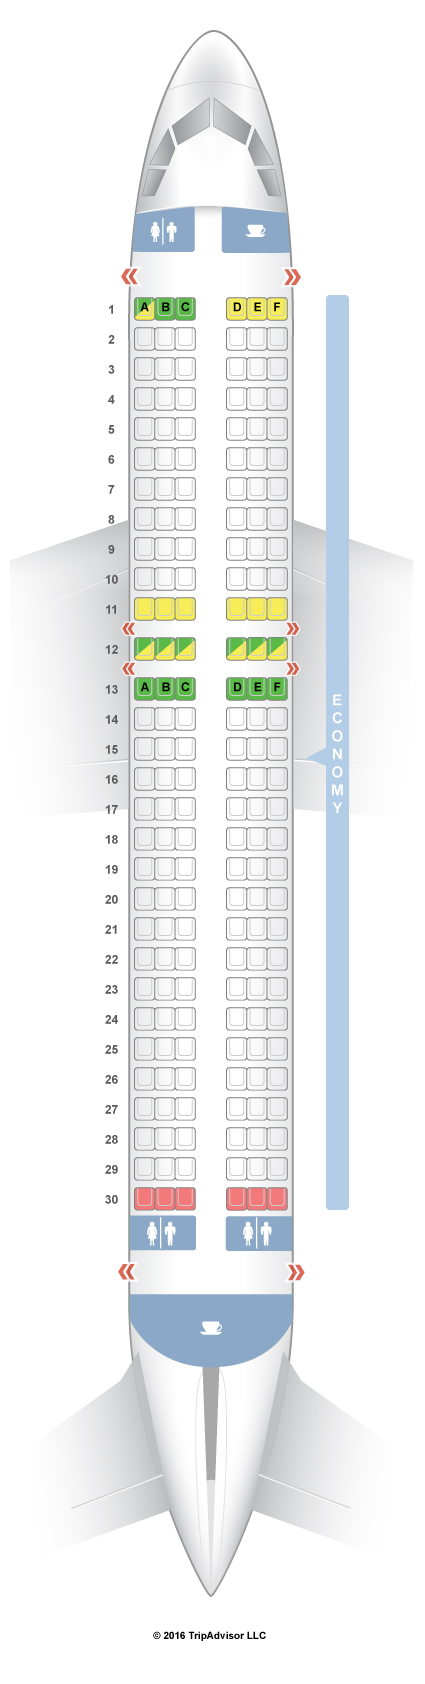 Jetstar_Airbus_A320.jpg